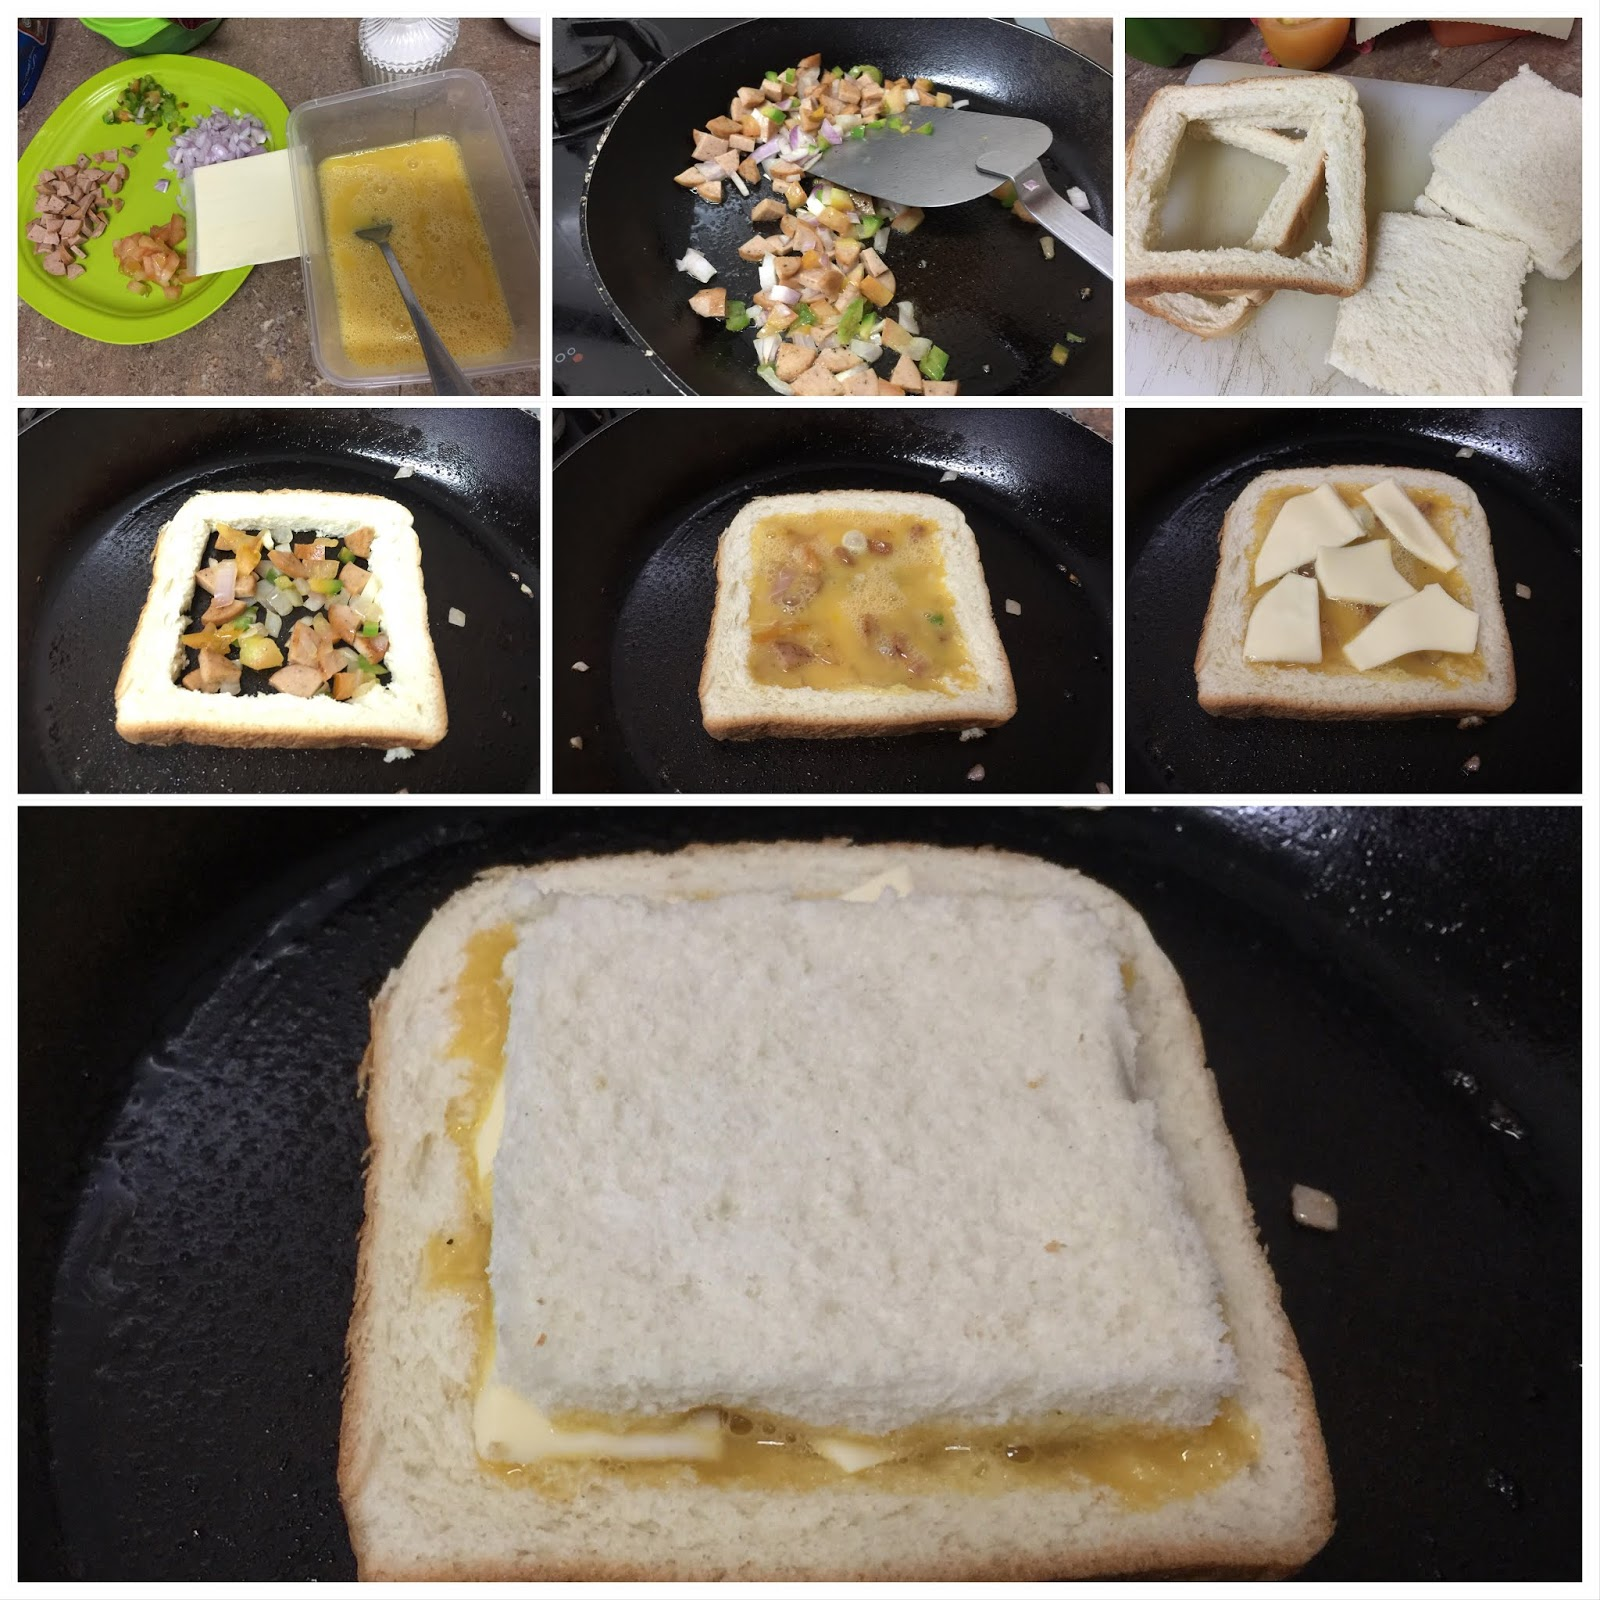 sarapan pagi, makanan kesukaan anak-anak, penarik anak untuk makan pagi